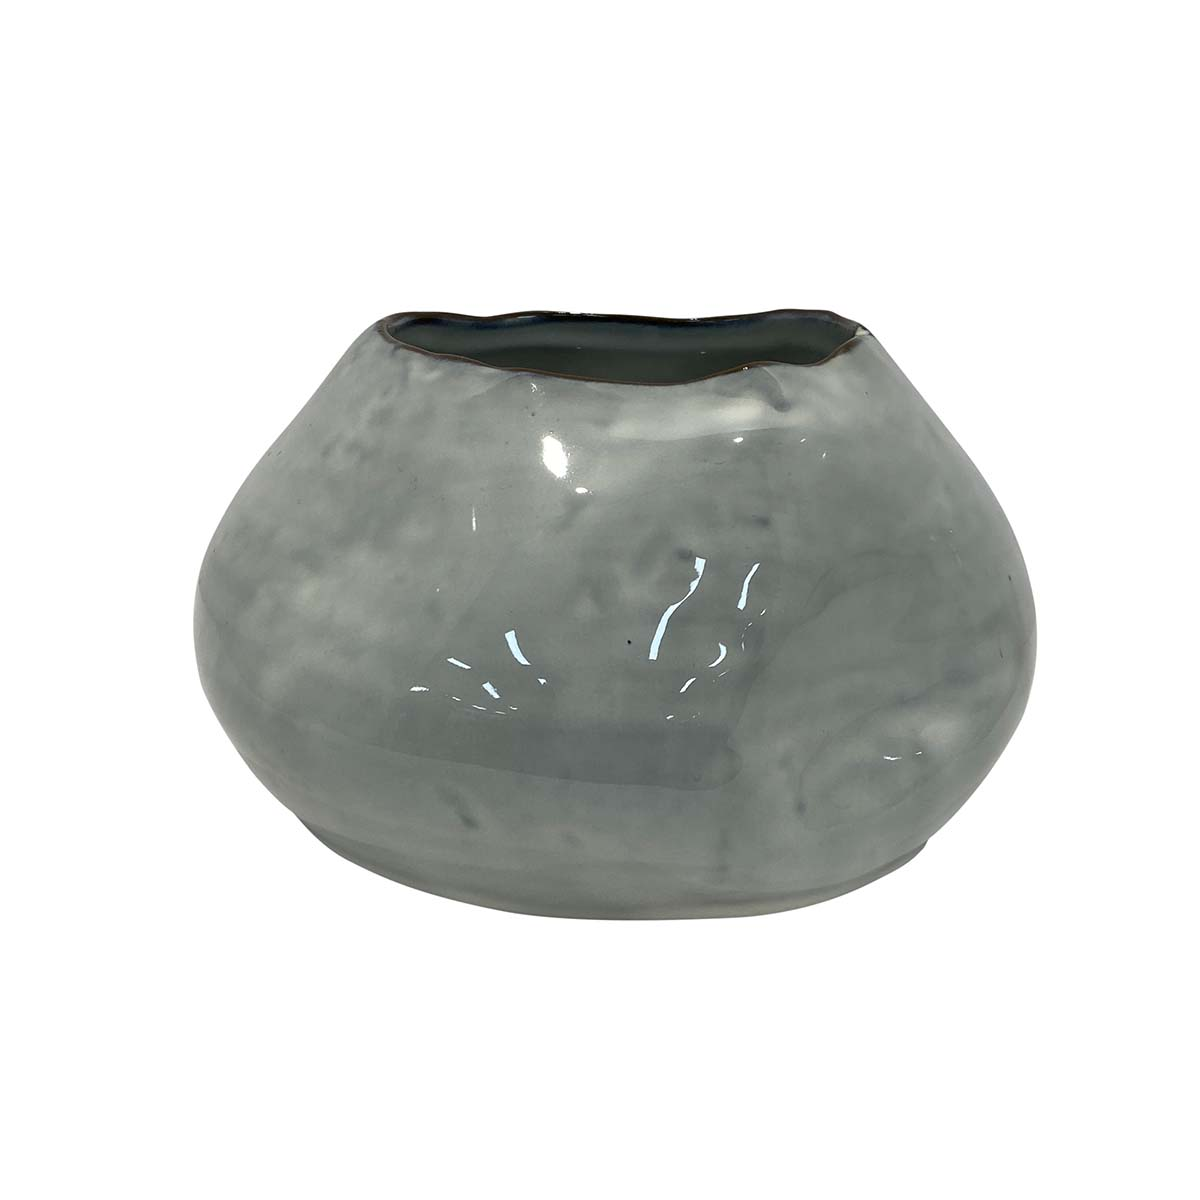 Indigo Halo Vase 17 x 12cm in Ceramic